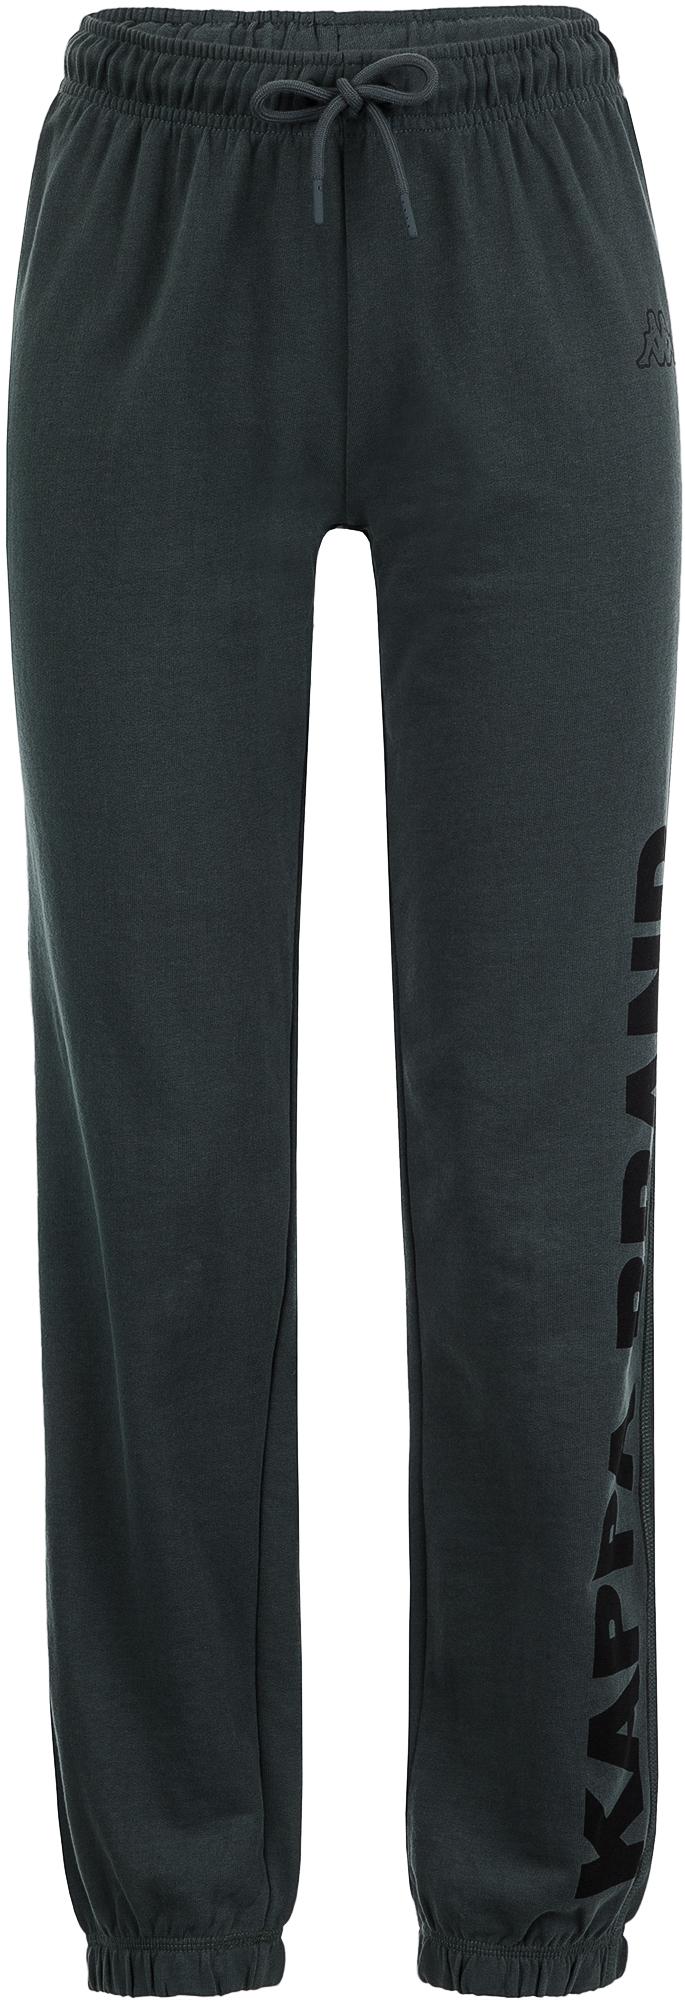 Kappa Брюки женские Kappa, размер 50 брюки женские sela цвет ночное небо p 115 878 8330 размер 44